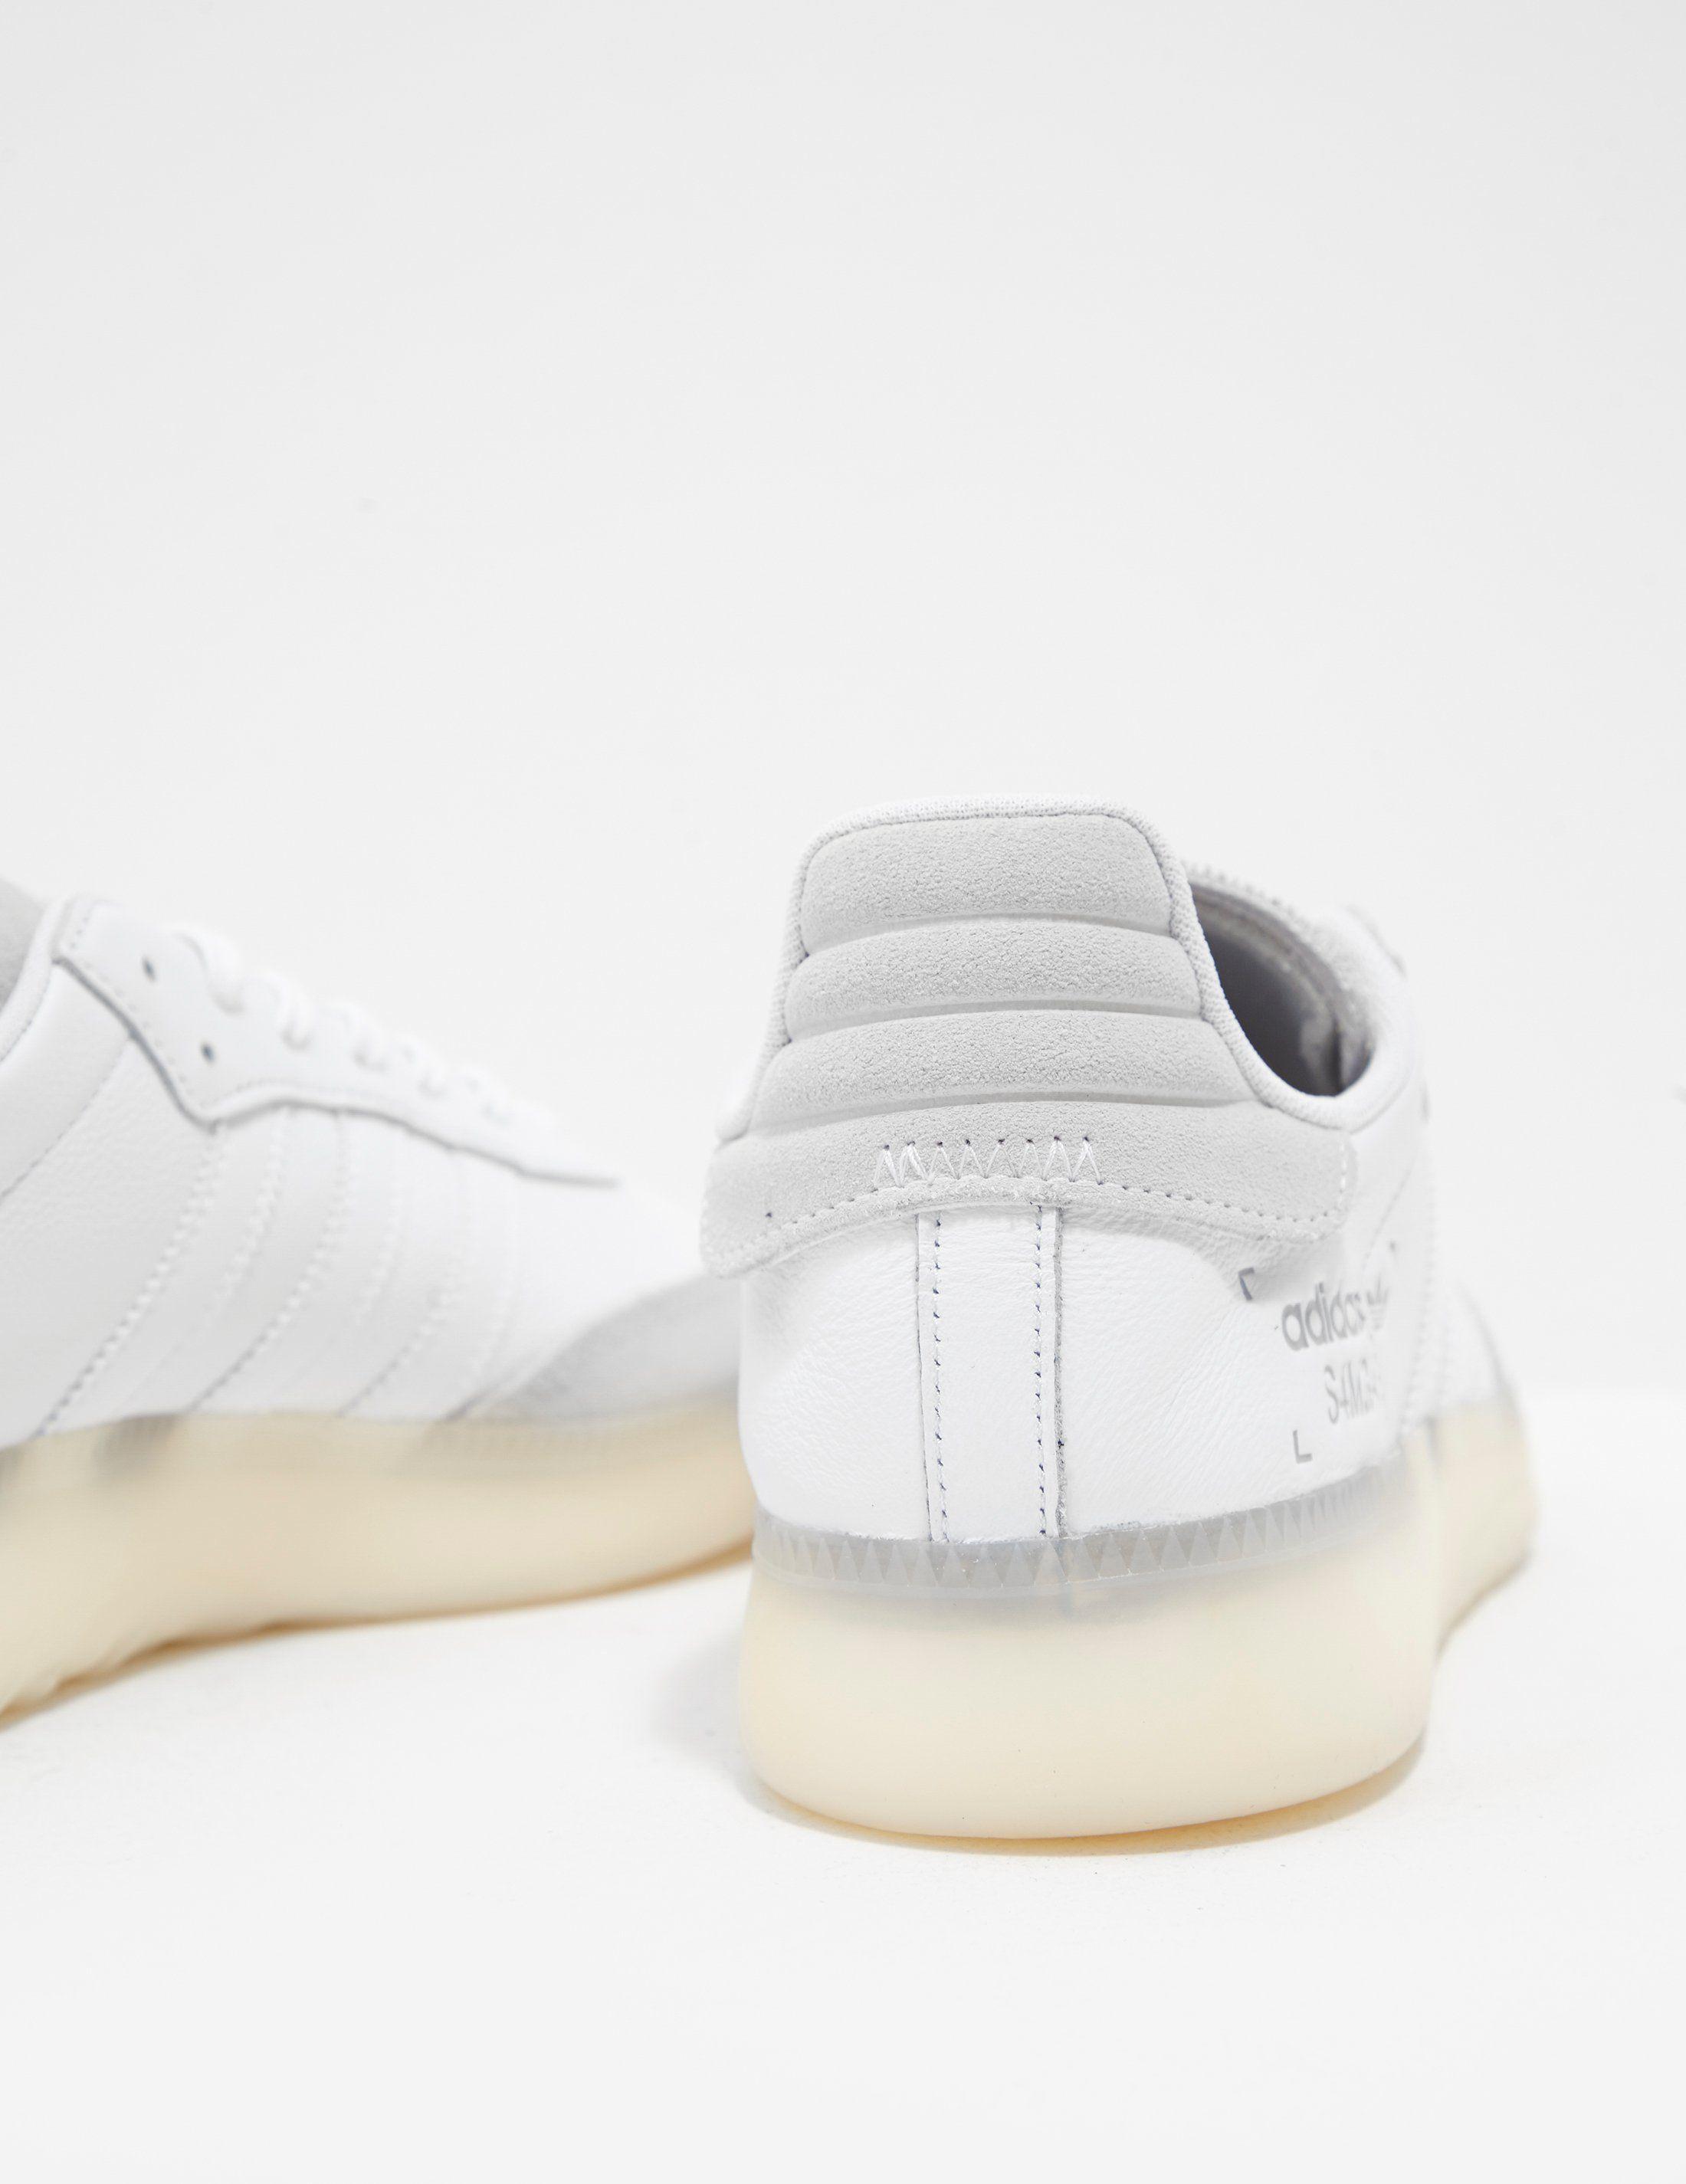 adidas Originals Samba RM